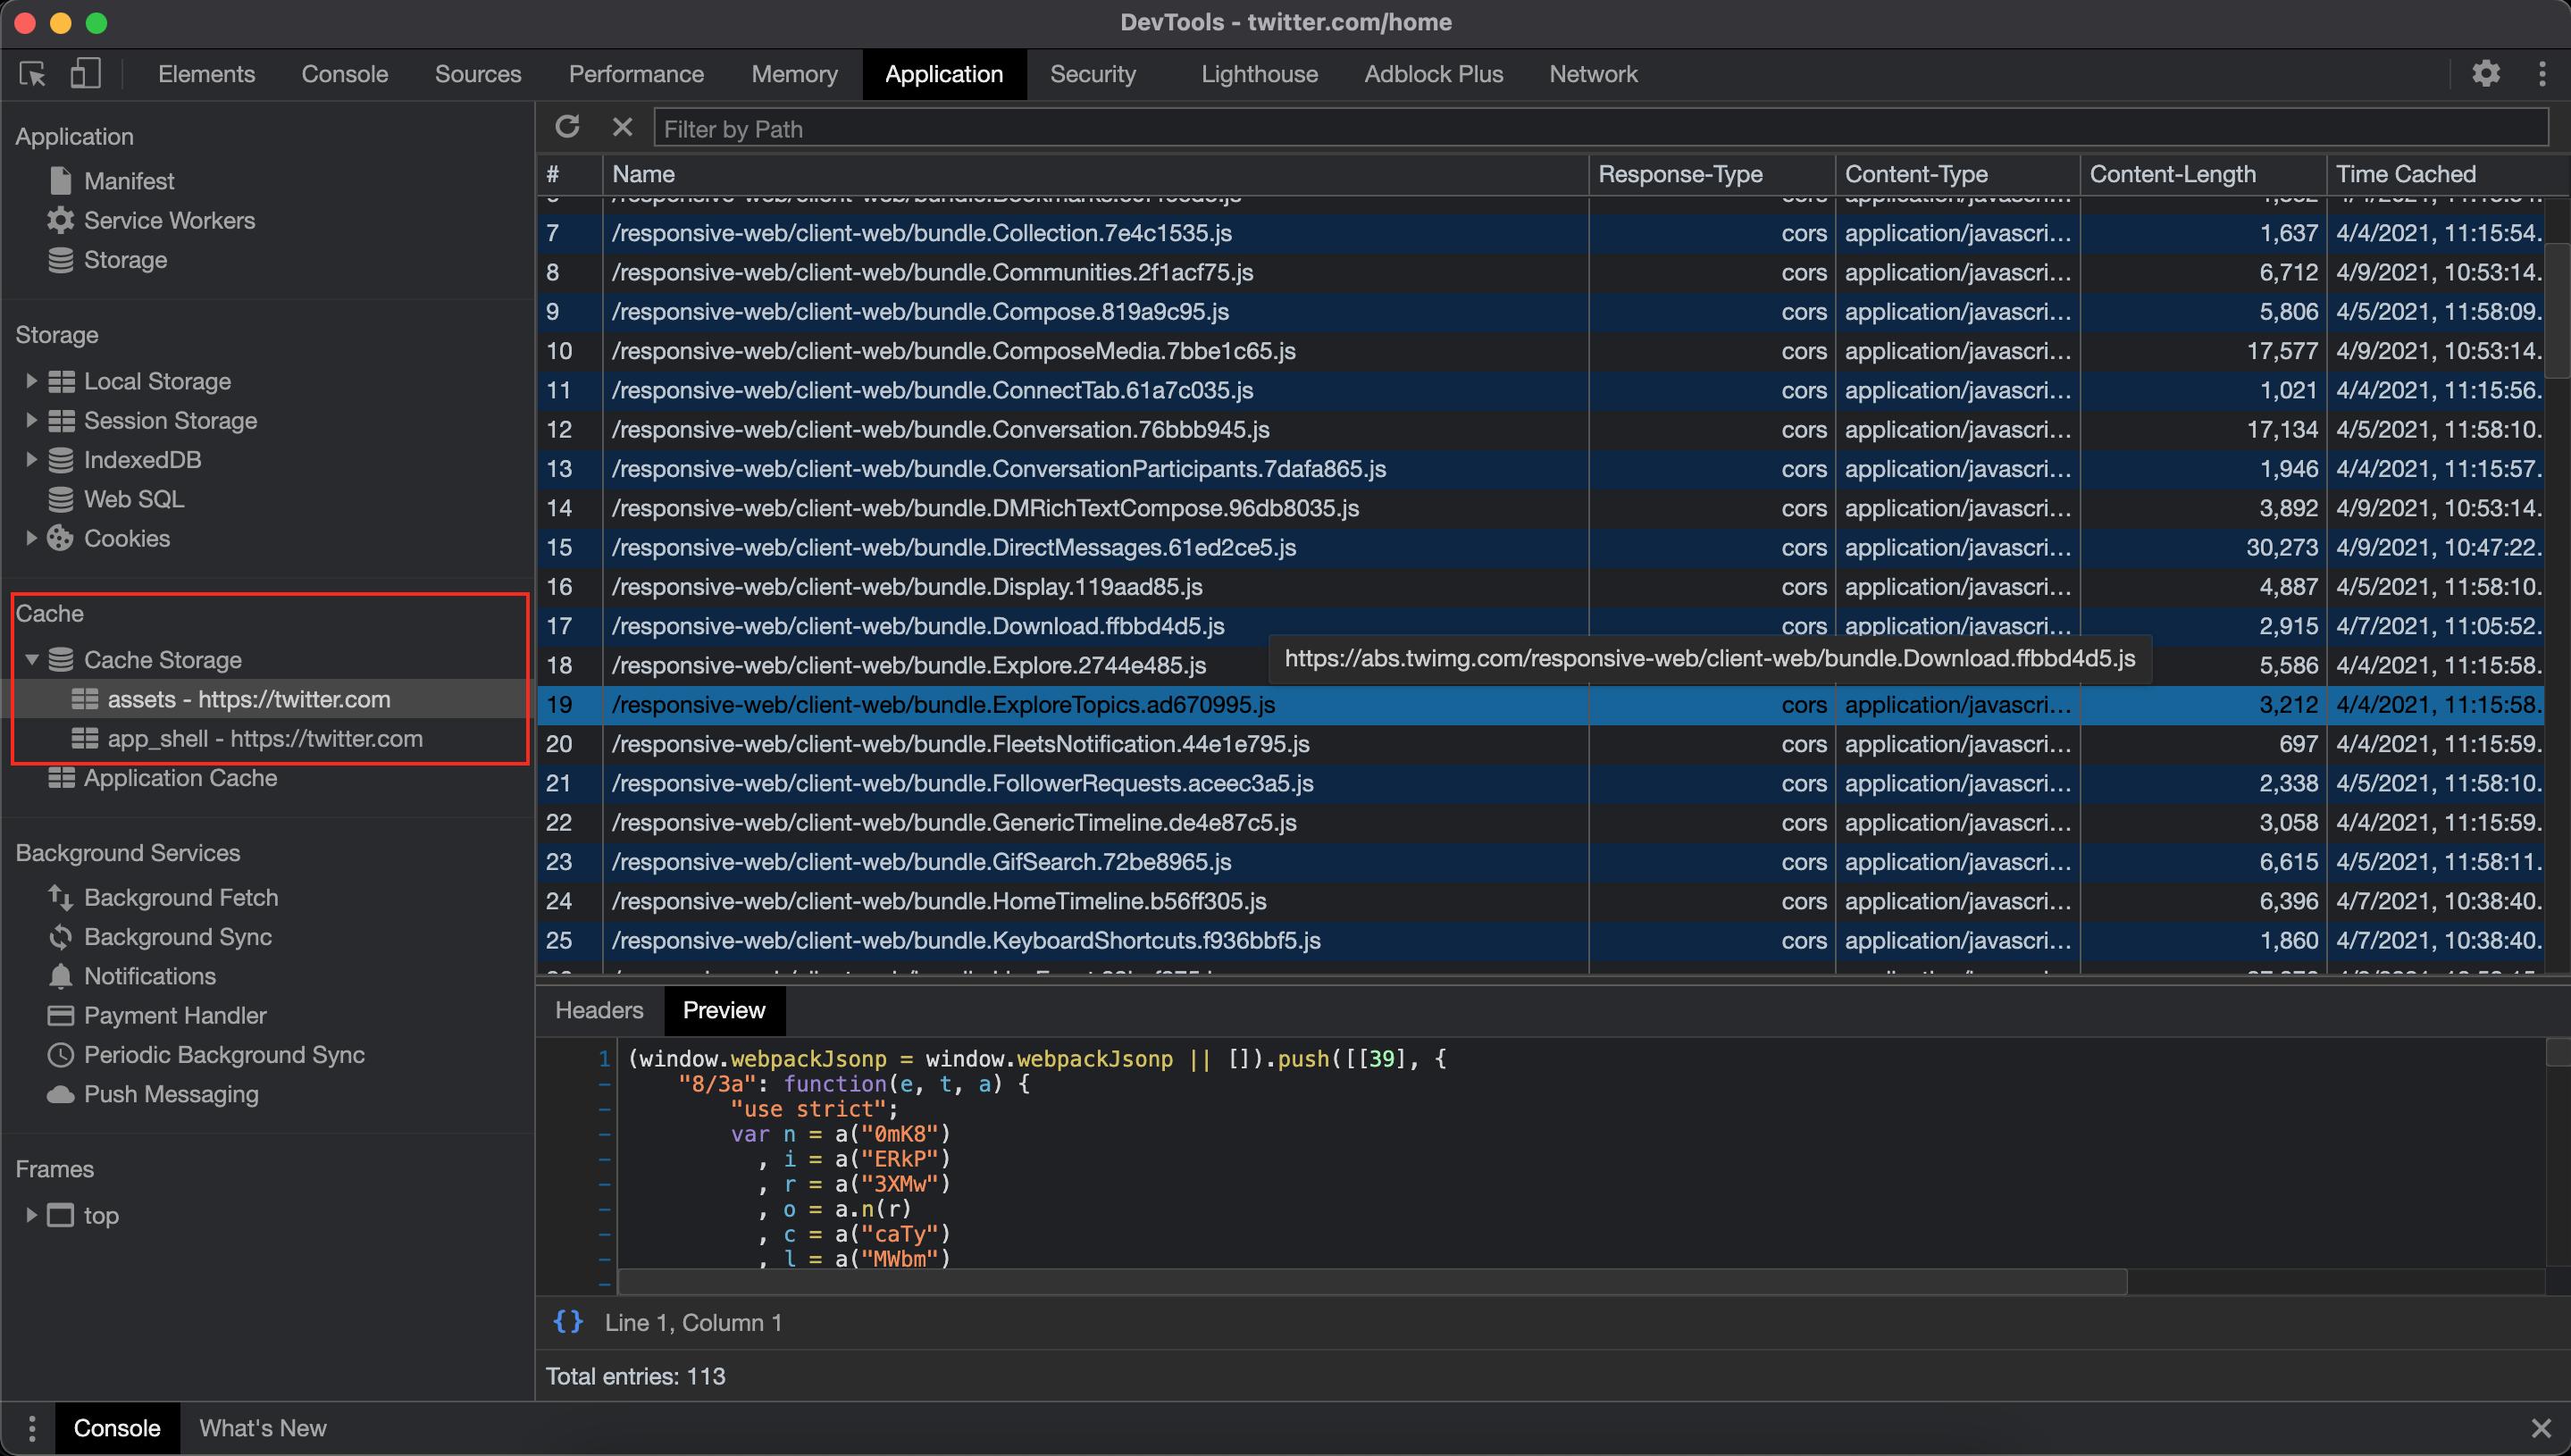 Twitter Cache Storage Chrome Dev Tools Screenshot